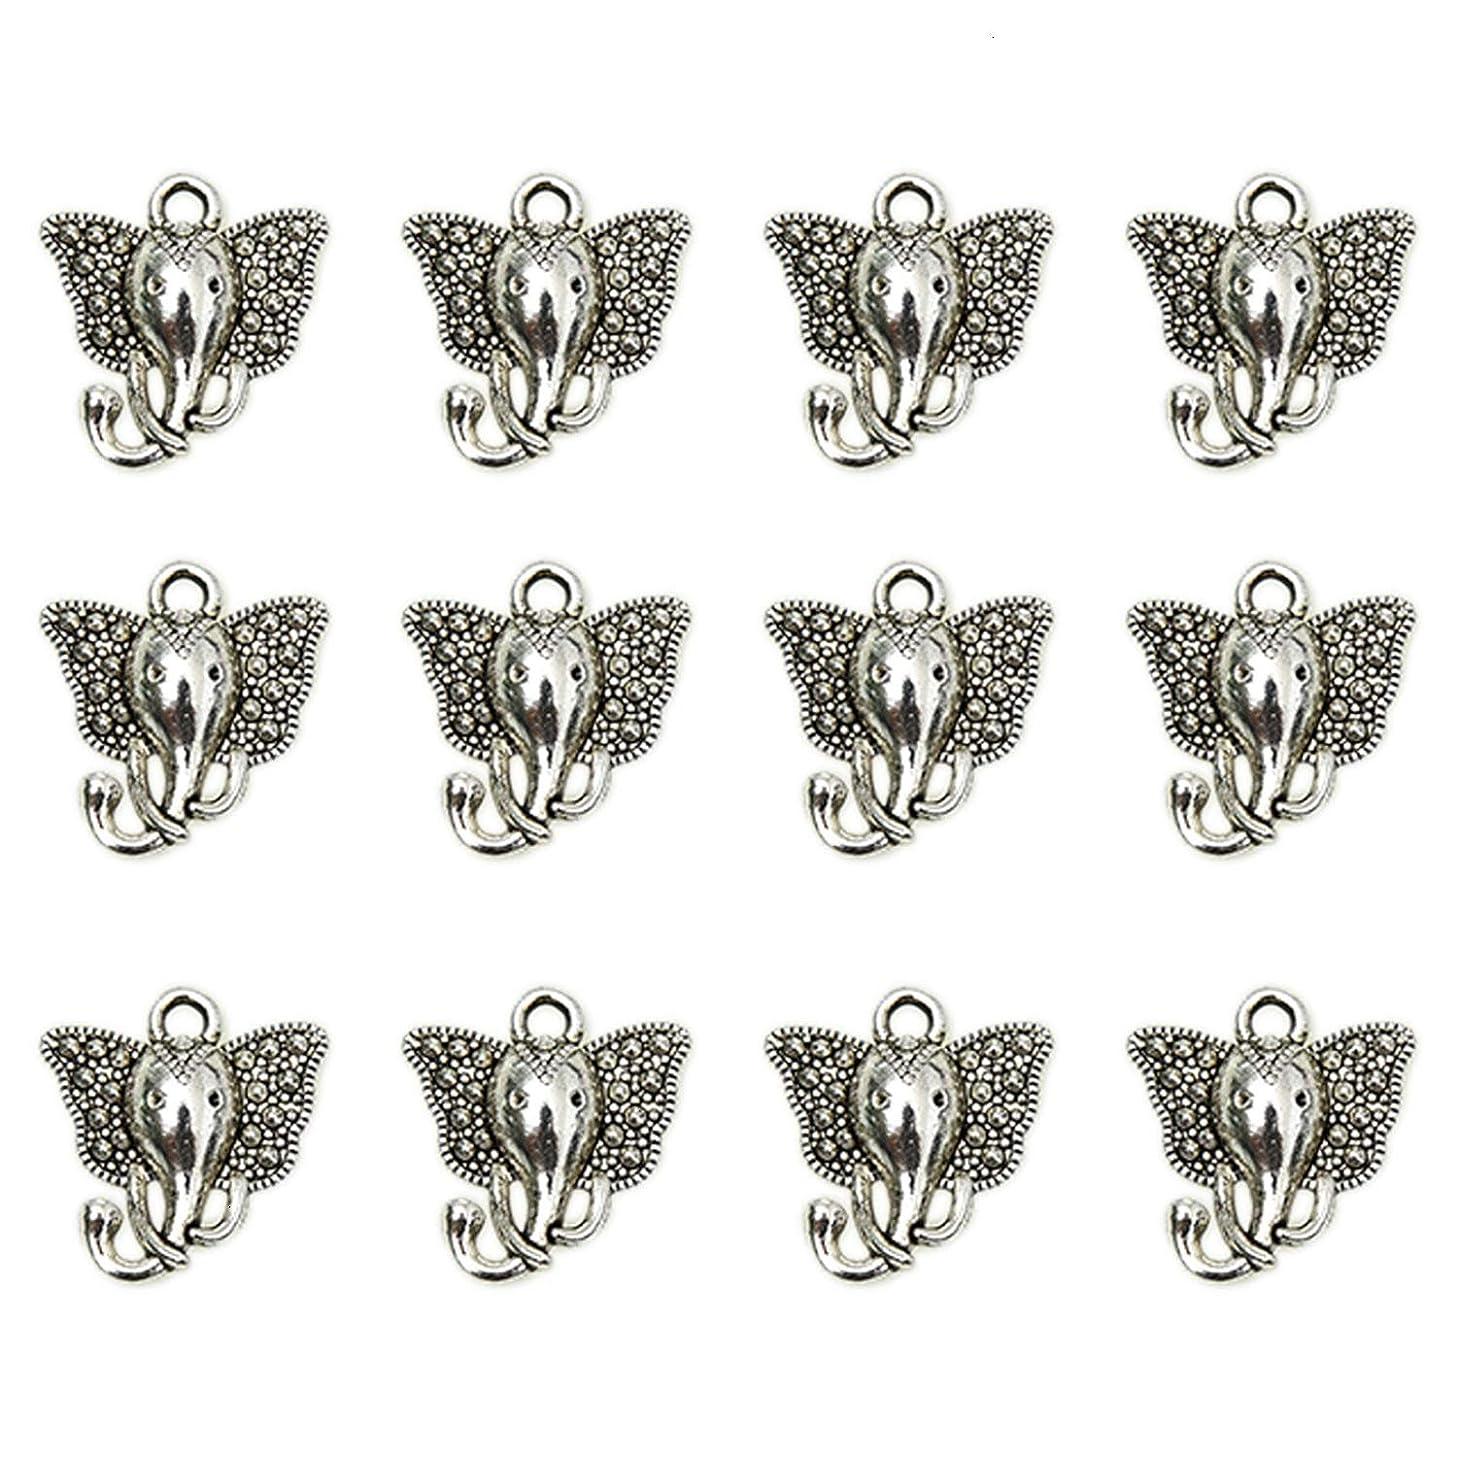 Monrocco 100 Pcs Antique Silver Alloy Elephant Charms Pendants Animal Head Charms Bulk for Bracelets Jewelry Making